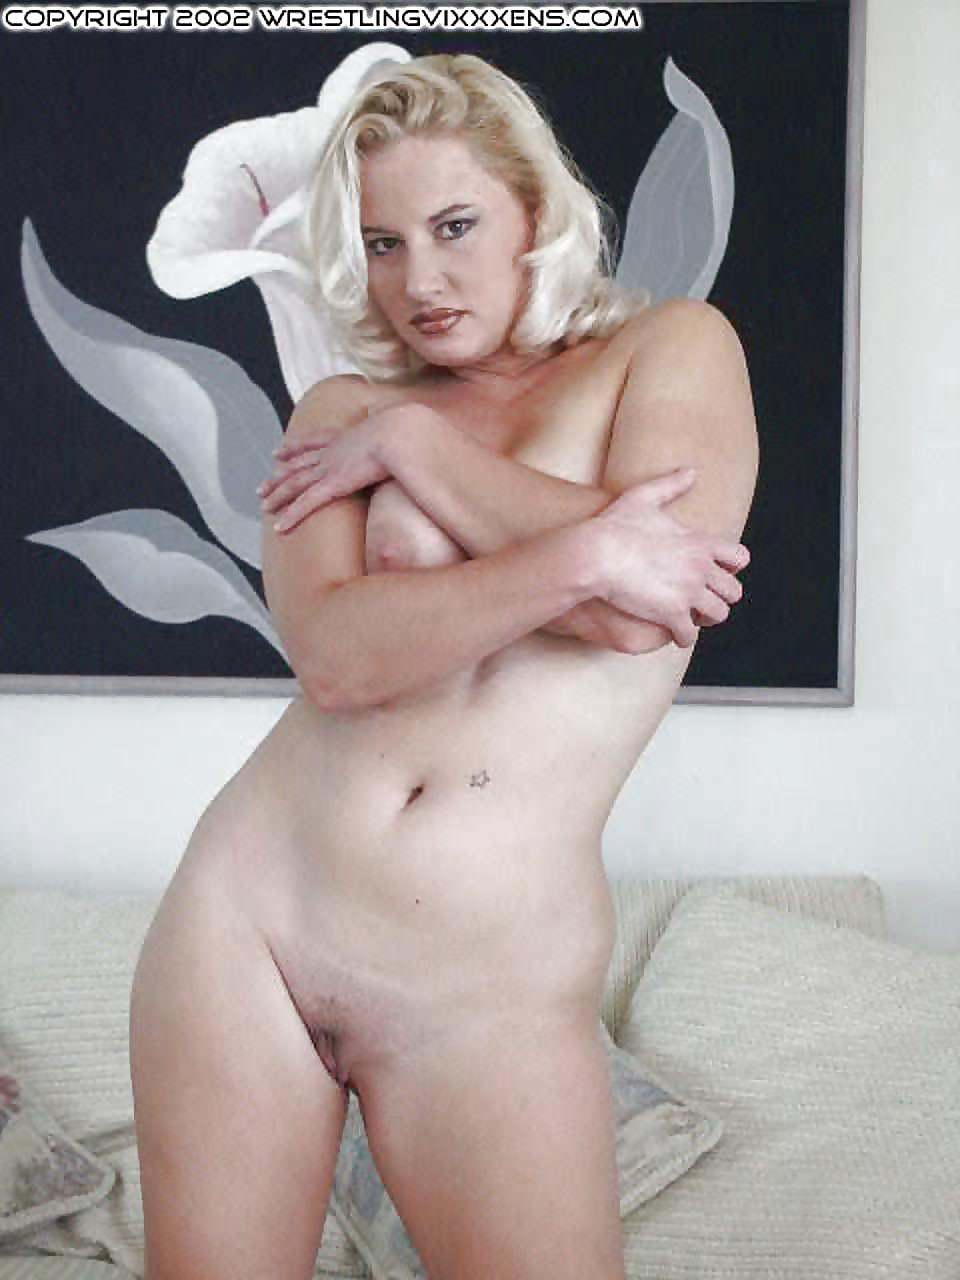 Swimsuit Tna Divas Naked Pictures Scenes